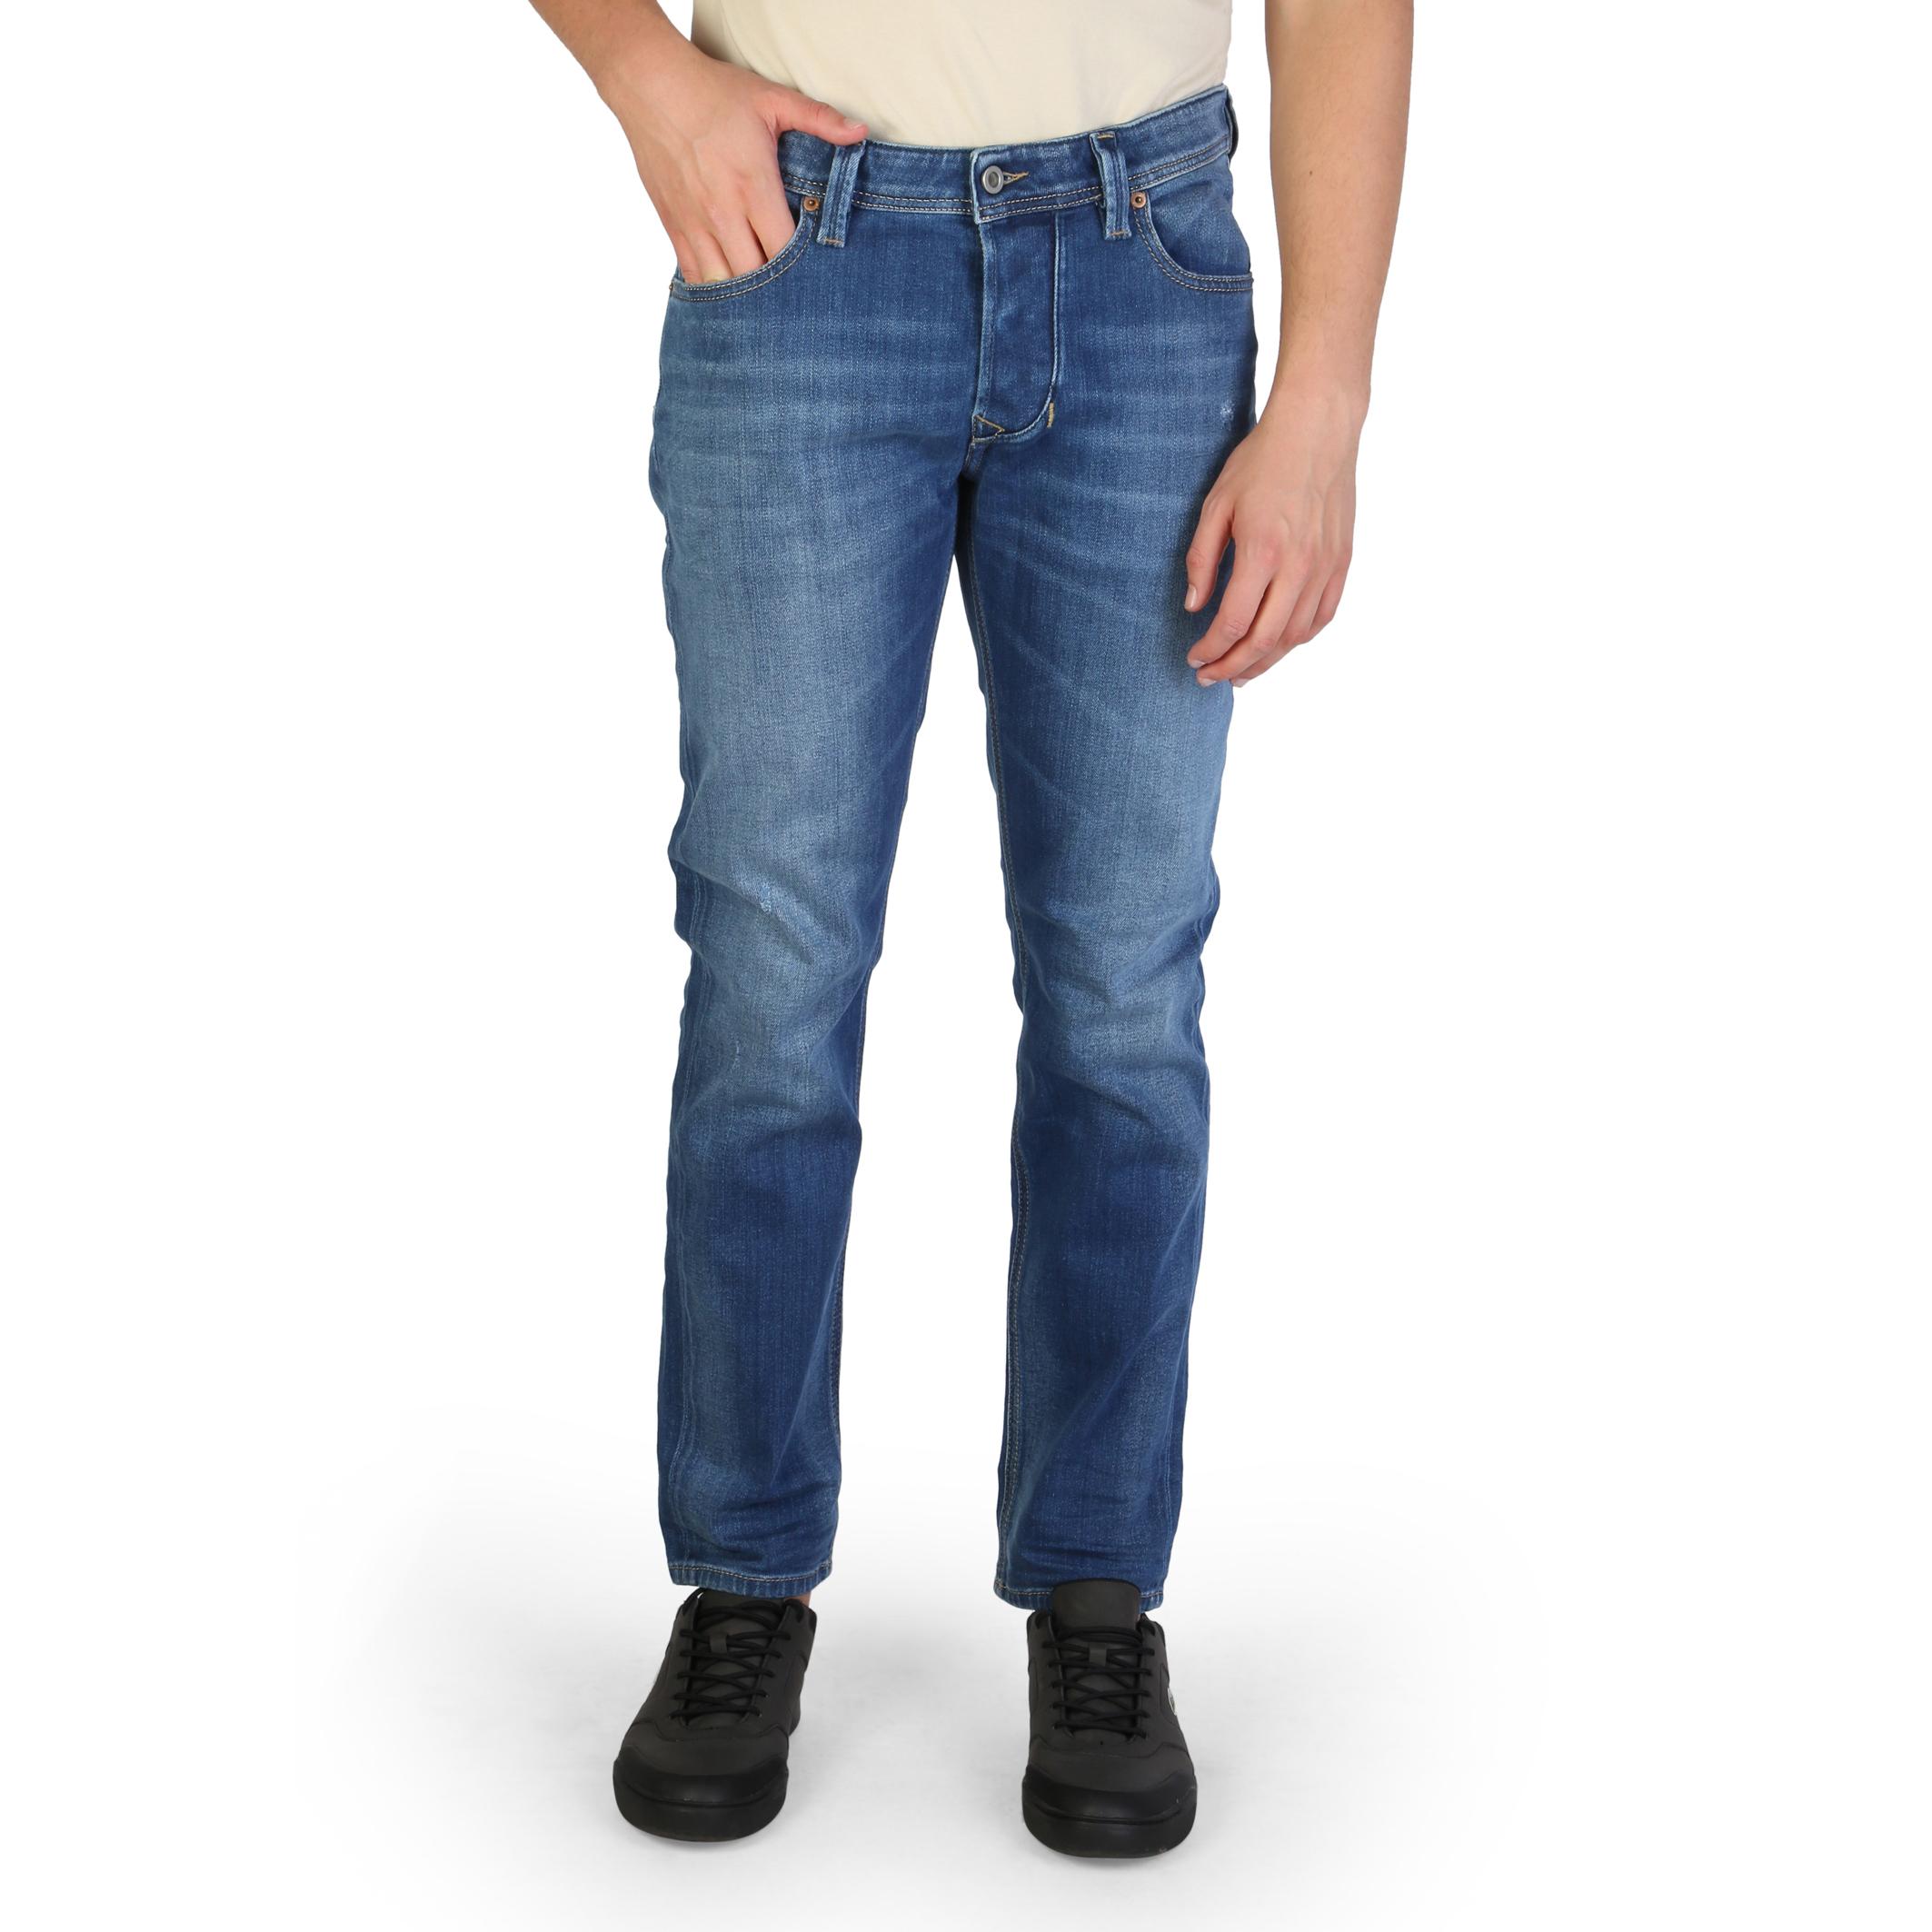 Jeans Diesel LARKEE-BEEX_L32_00SU1X Uomo Blu 100051